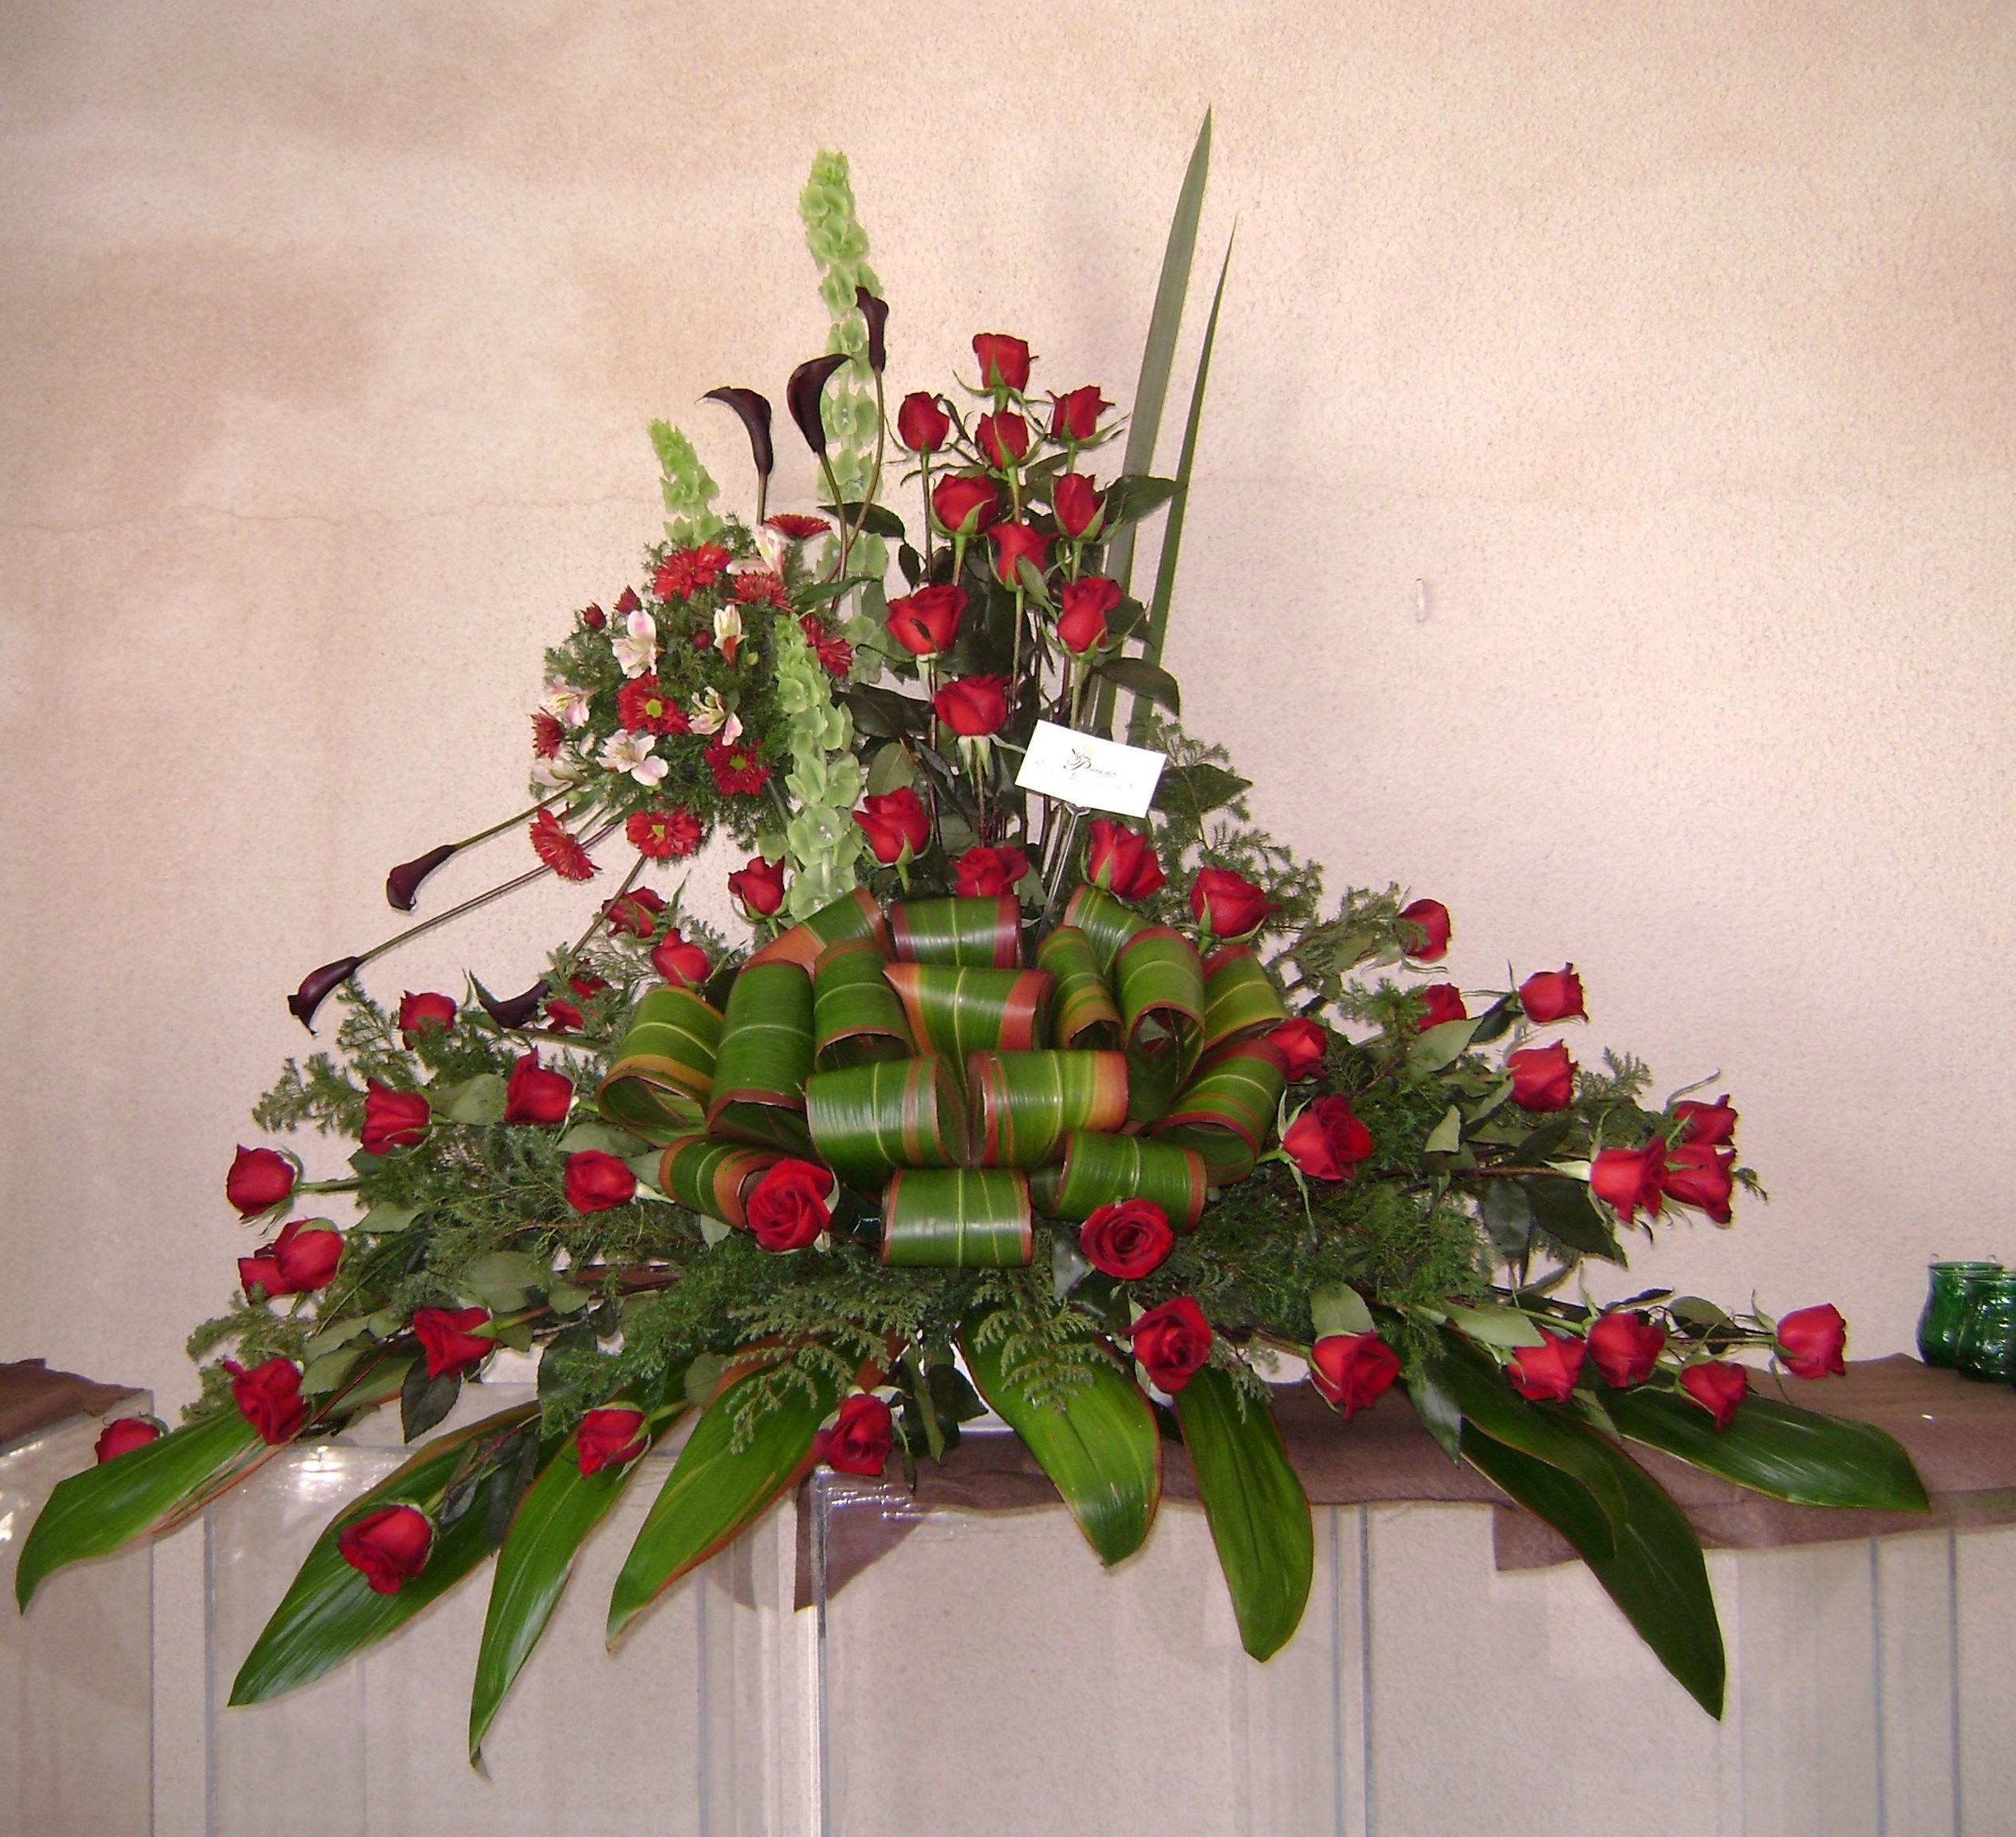 Wedding Flowers Keighley: Arranjos De Flores, Fotos De